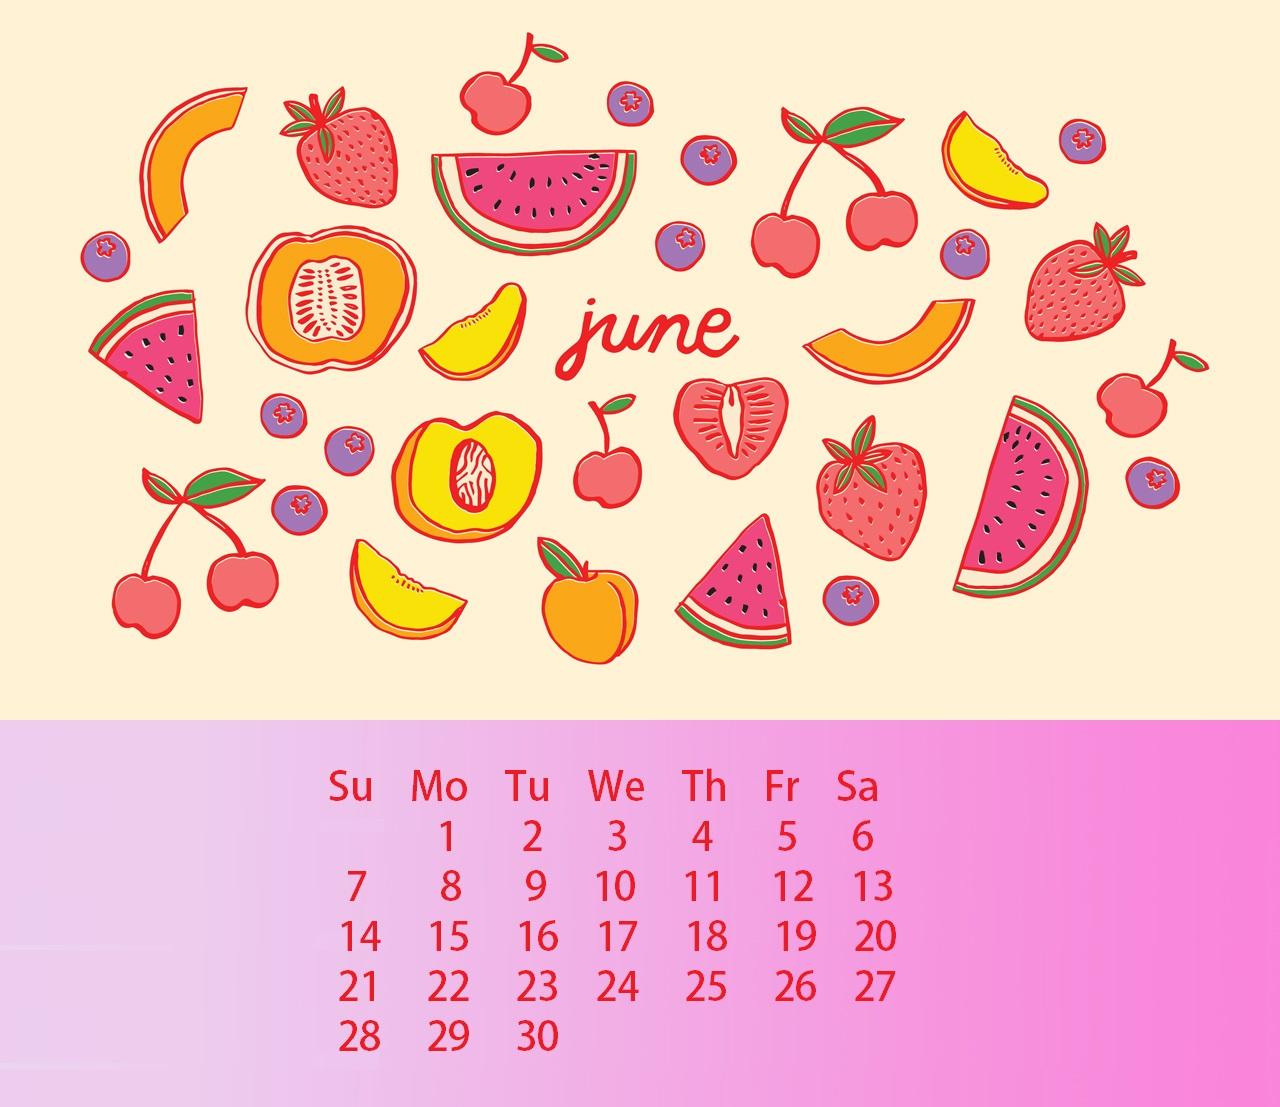 June 2020 Calendar Wallpaper